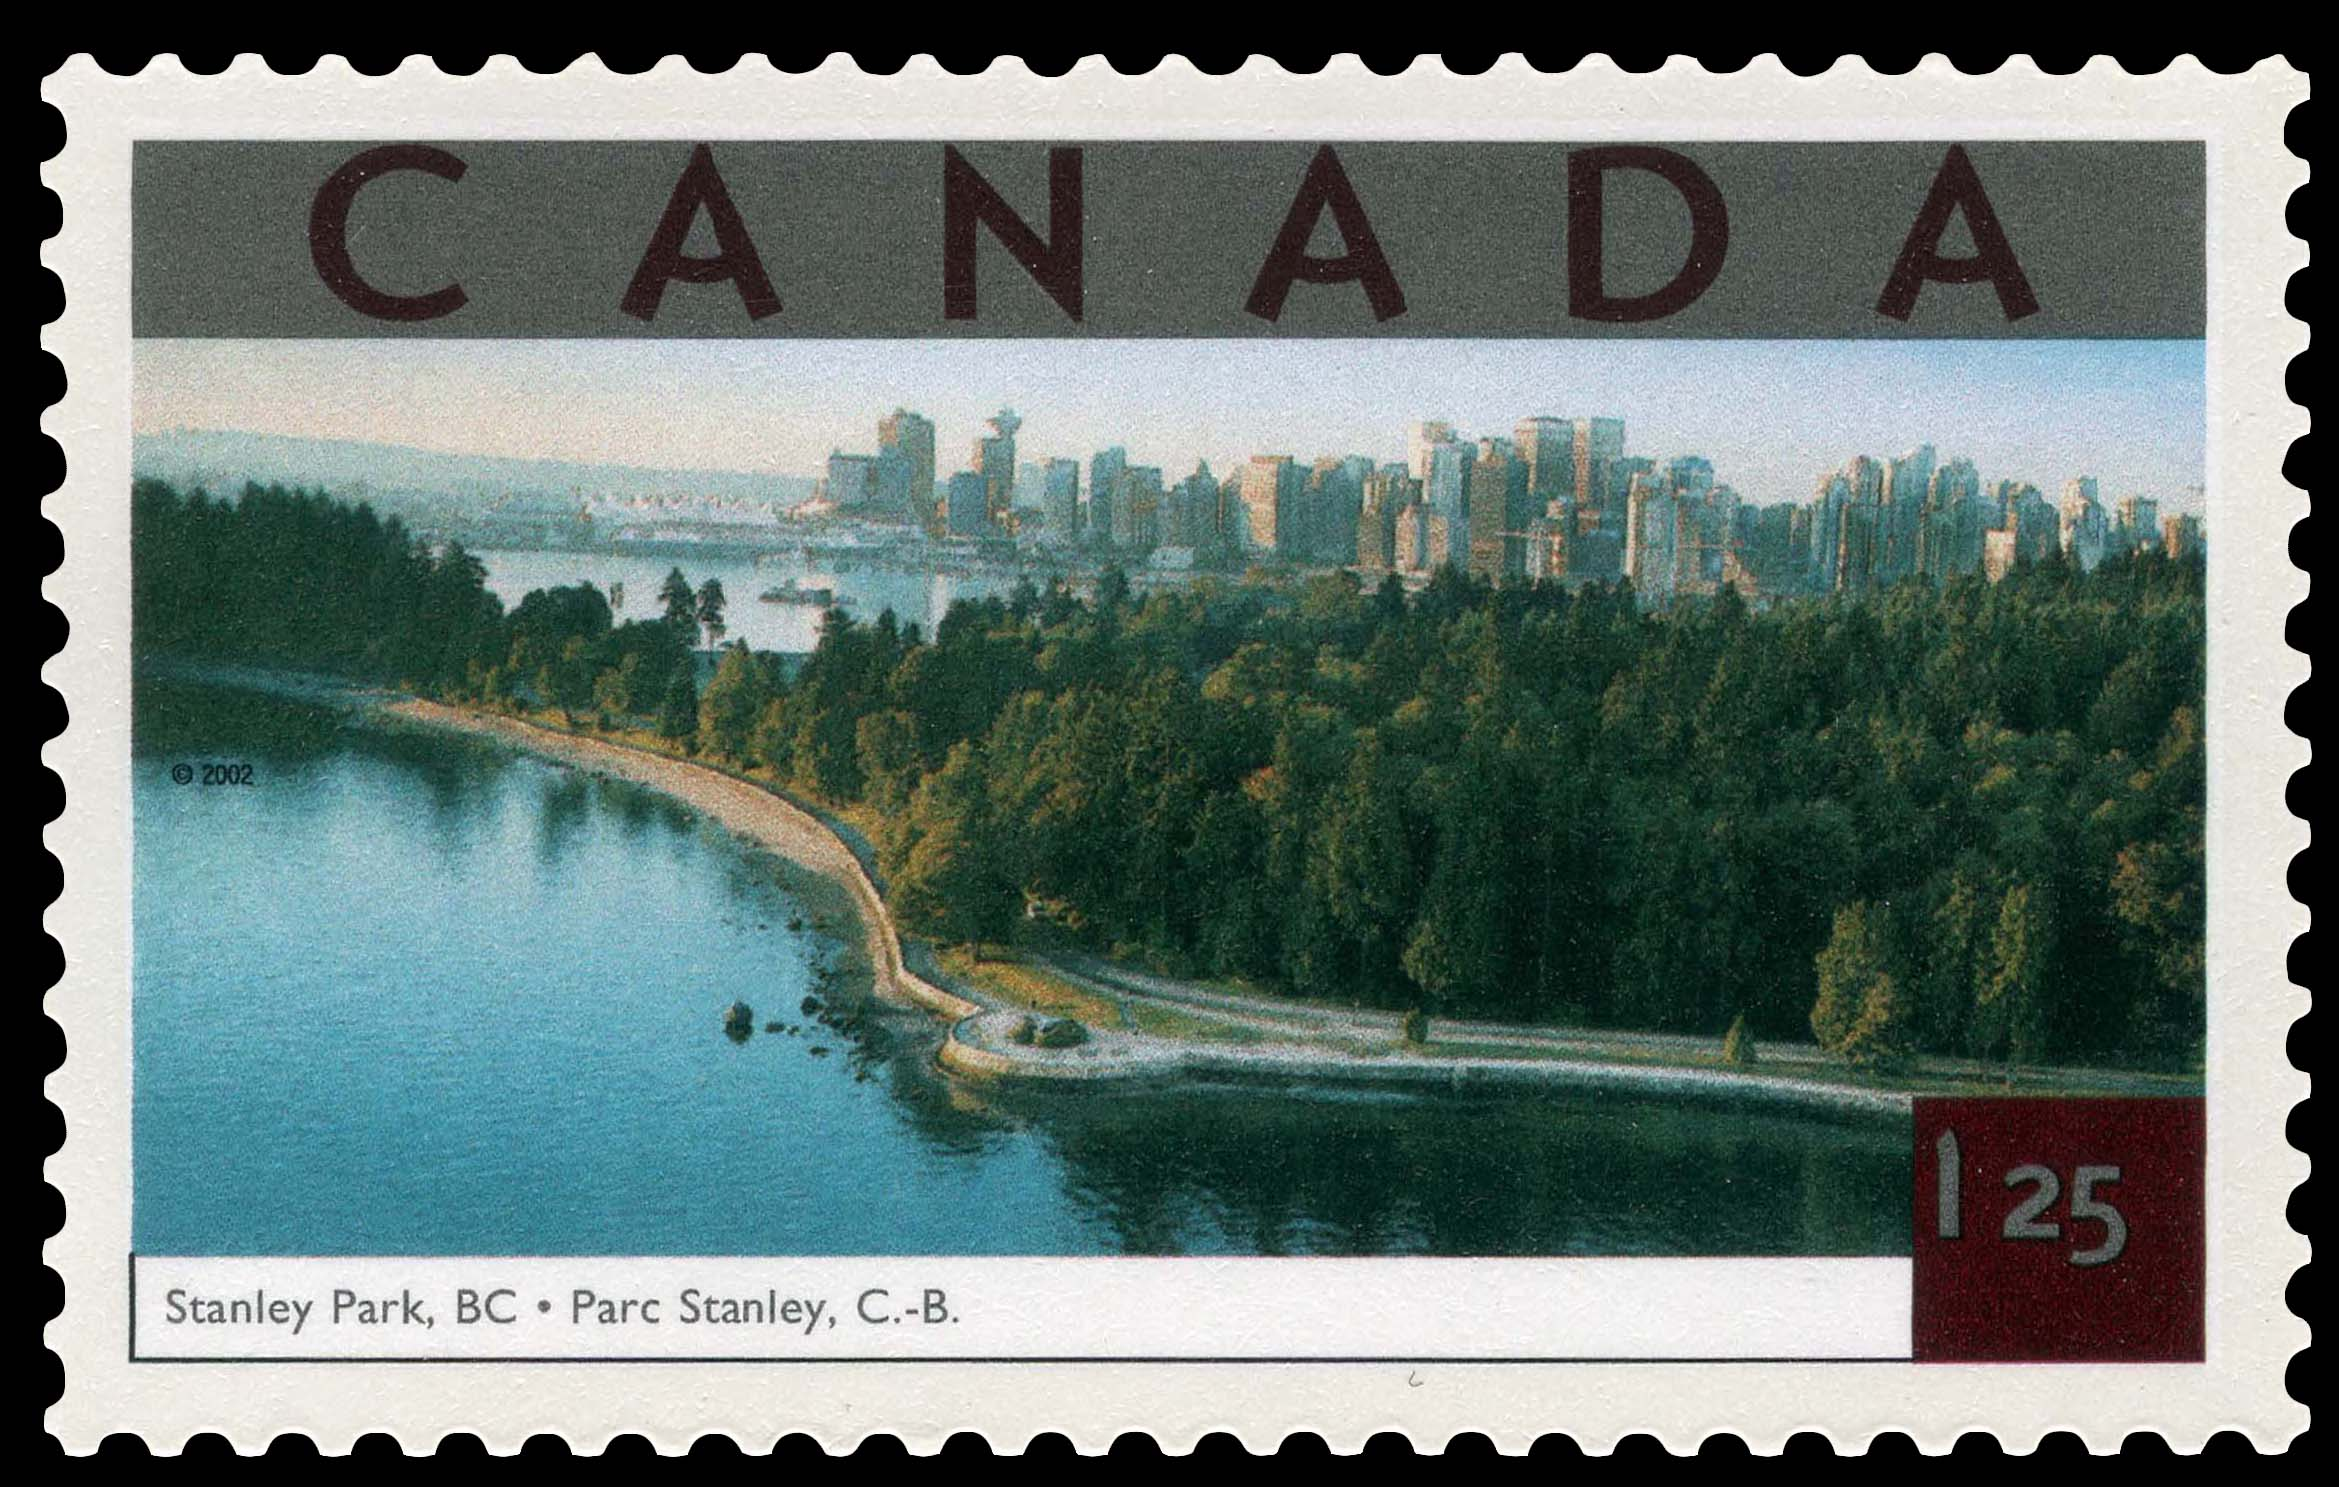 Stanley Park, British Columbia Canada Postage Stamp | Tourist Attractions